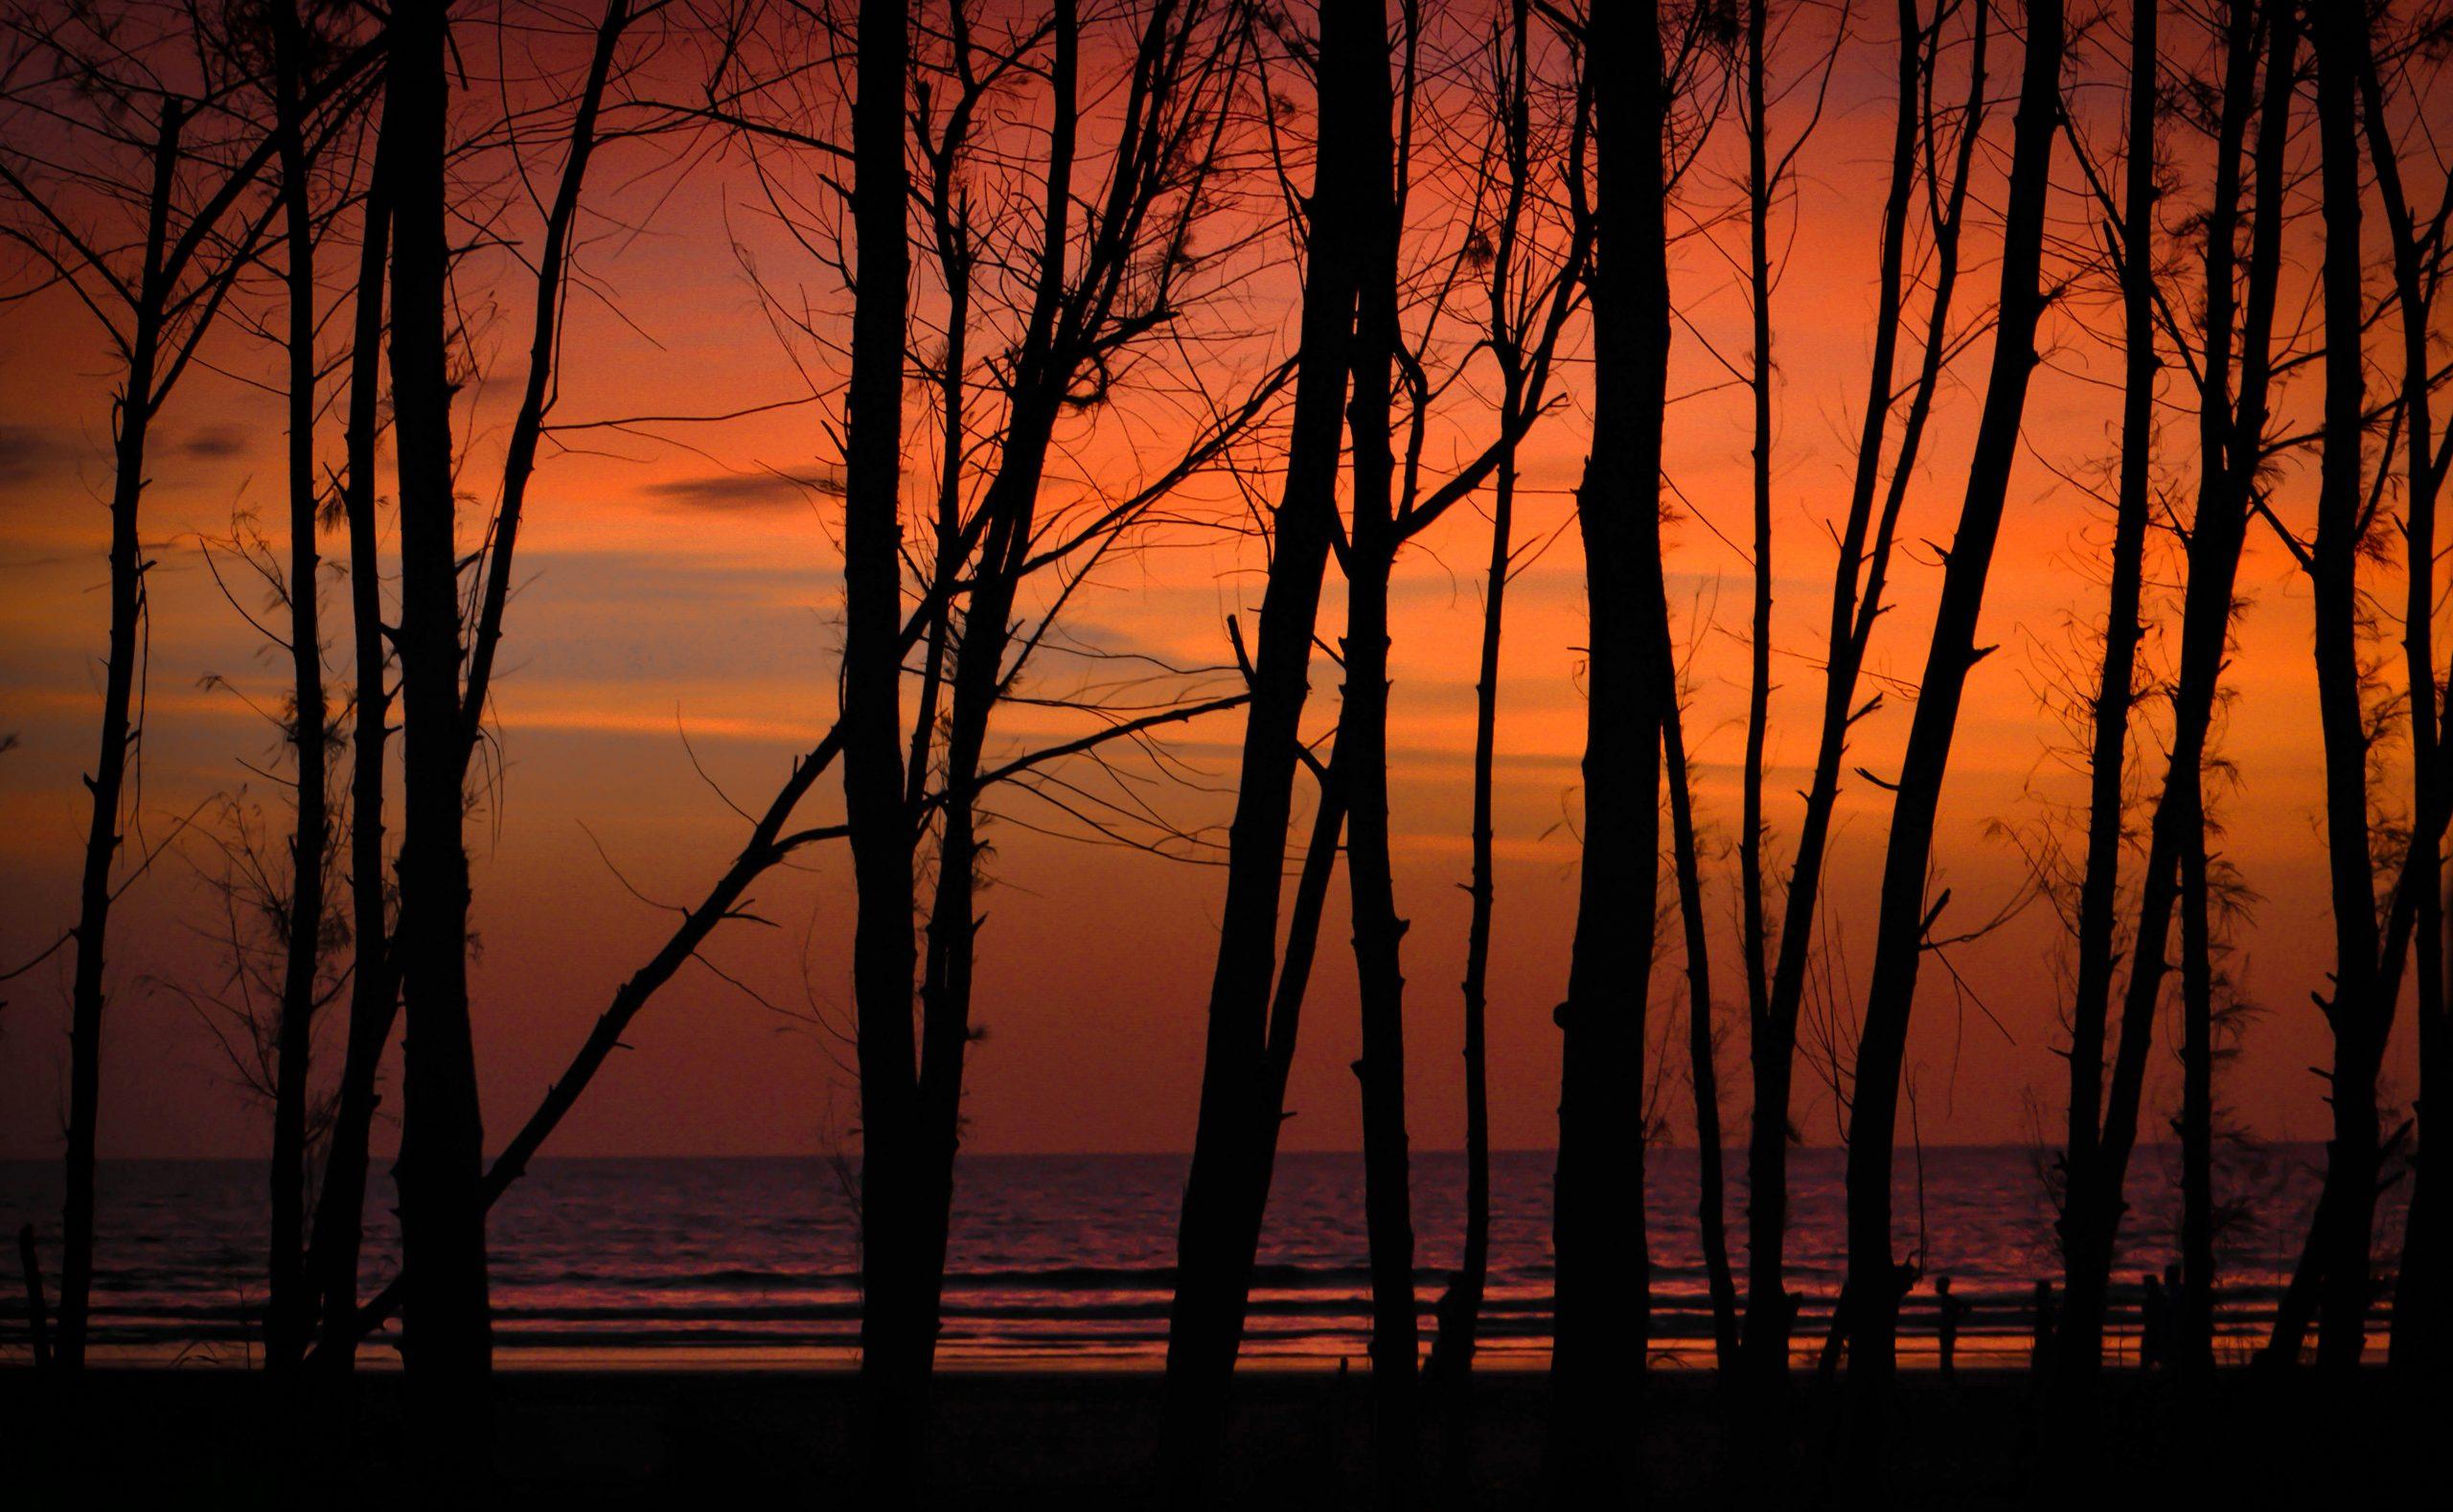 Sunset at Bhuigaon beach in Virar